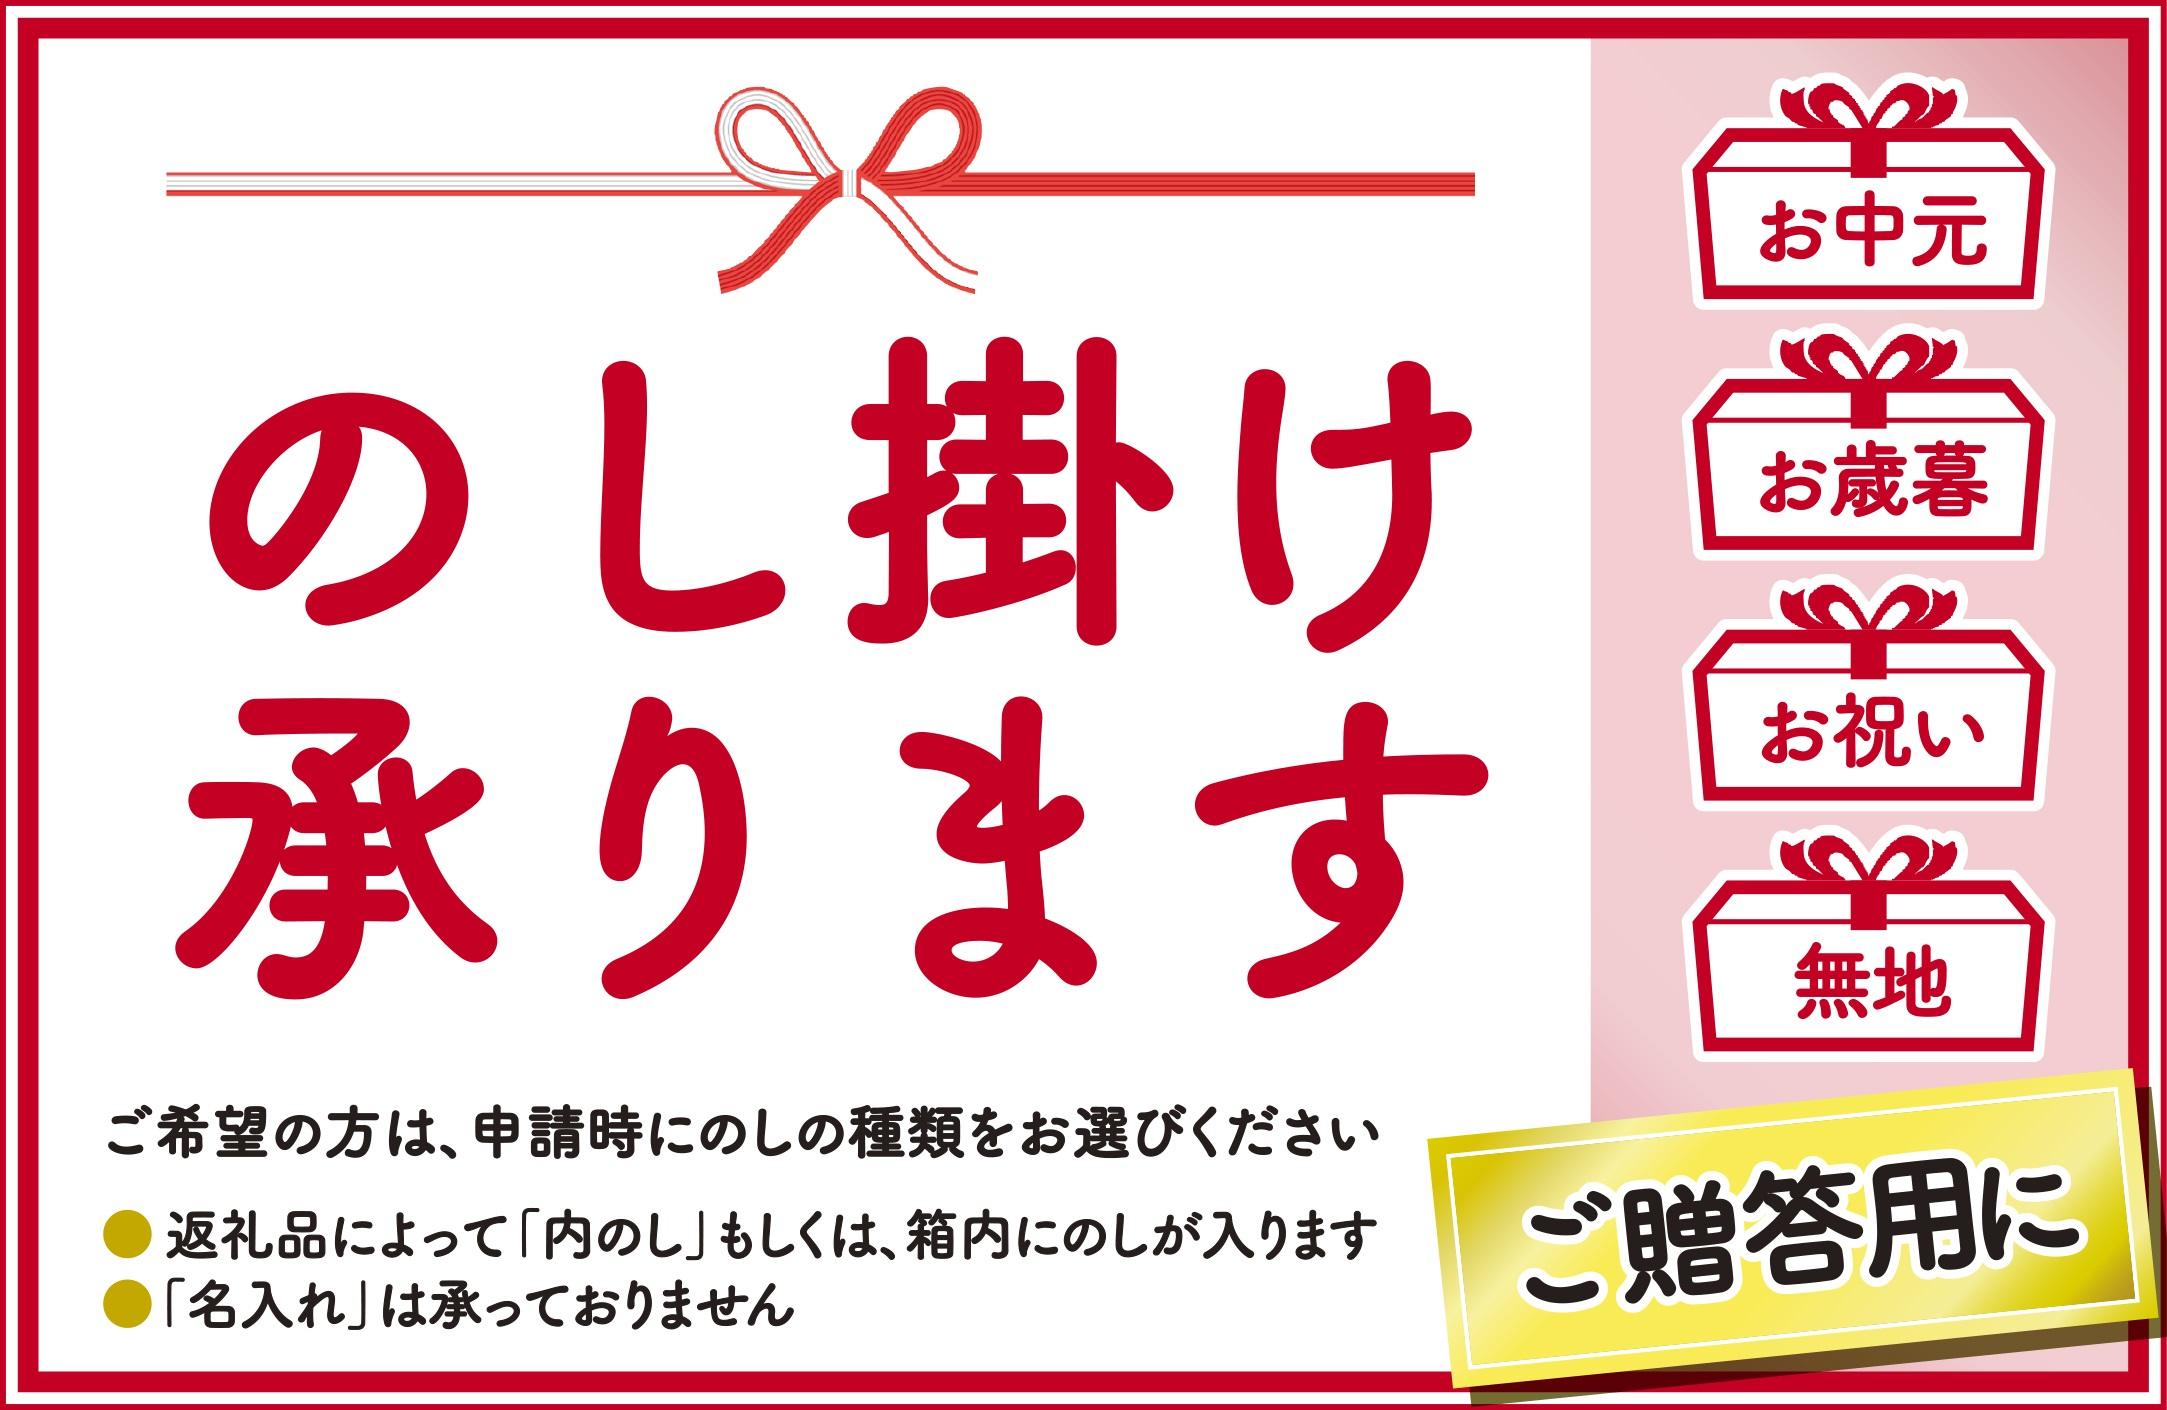 DEER BUTTER えぞ鹿天然油・ペットケアクリーム PH7.5【各1缶】※鹿油化粧品